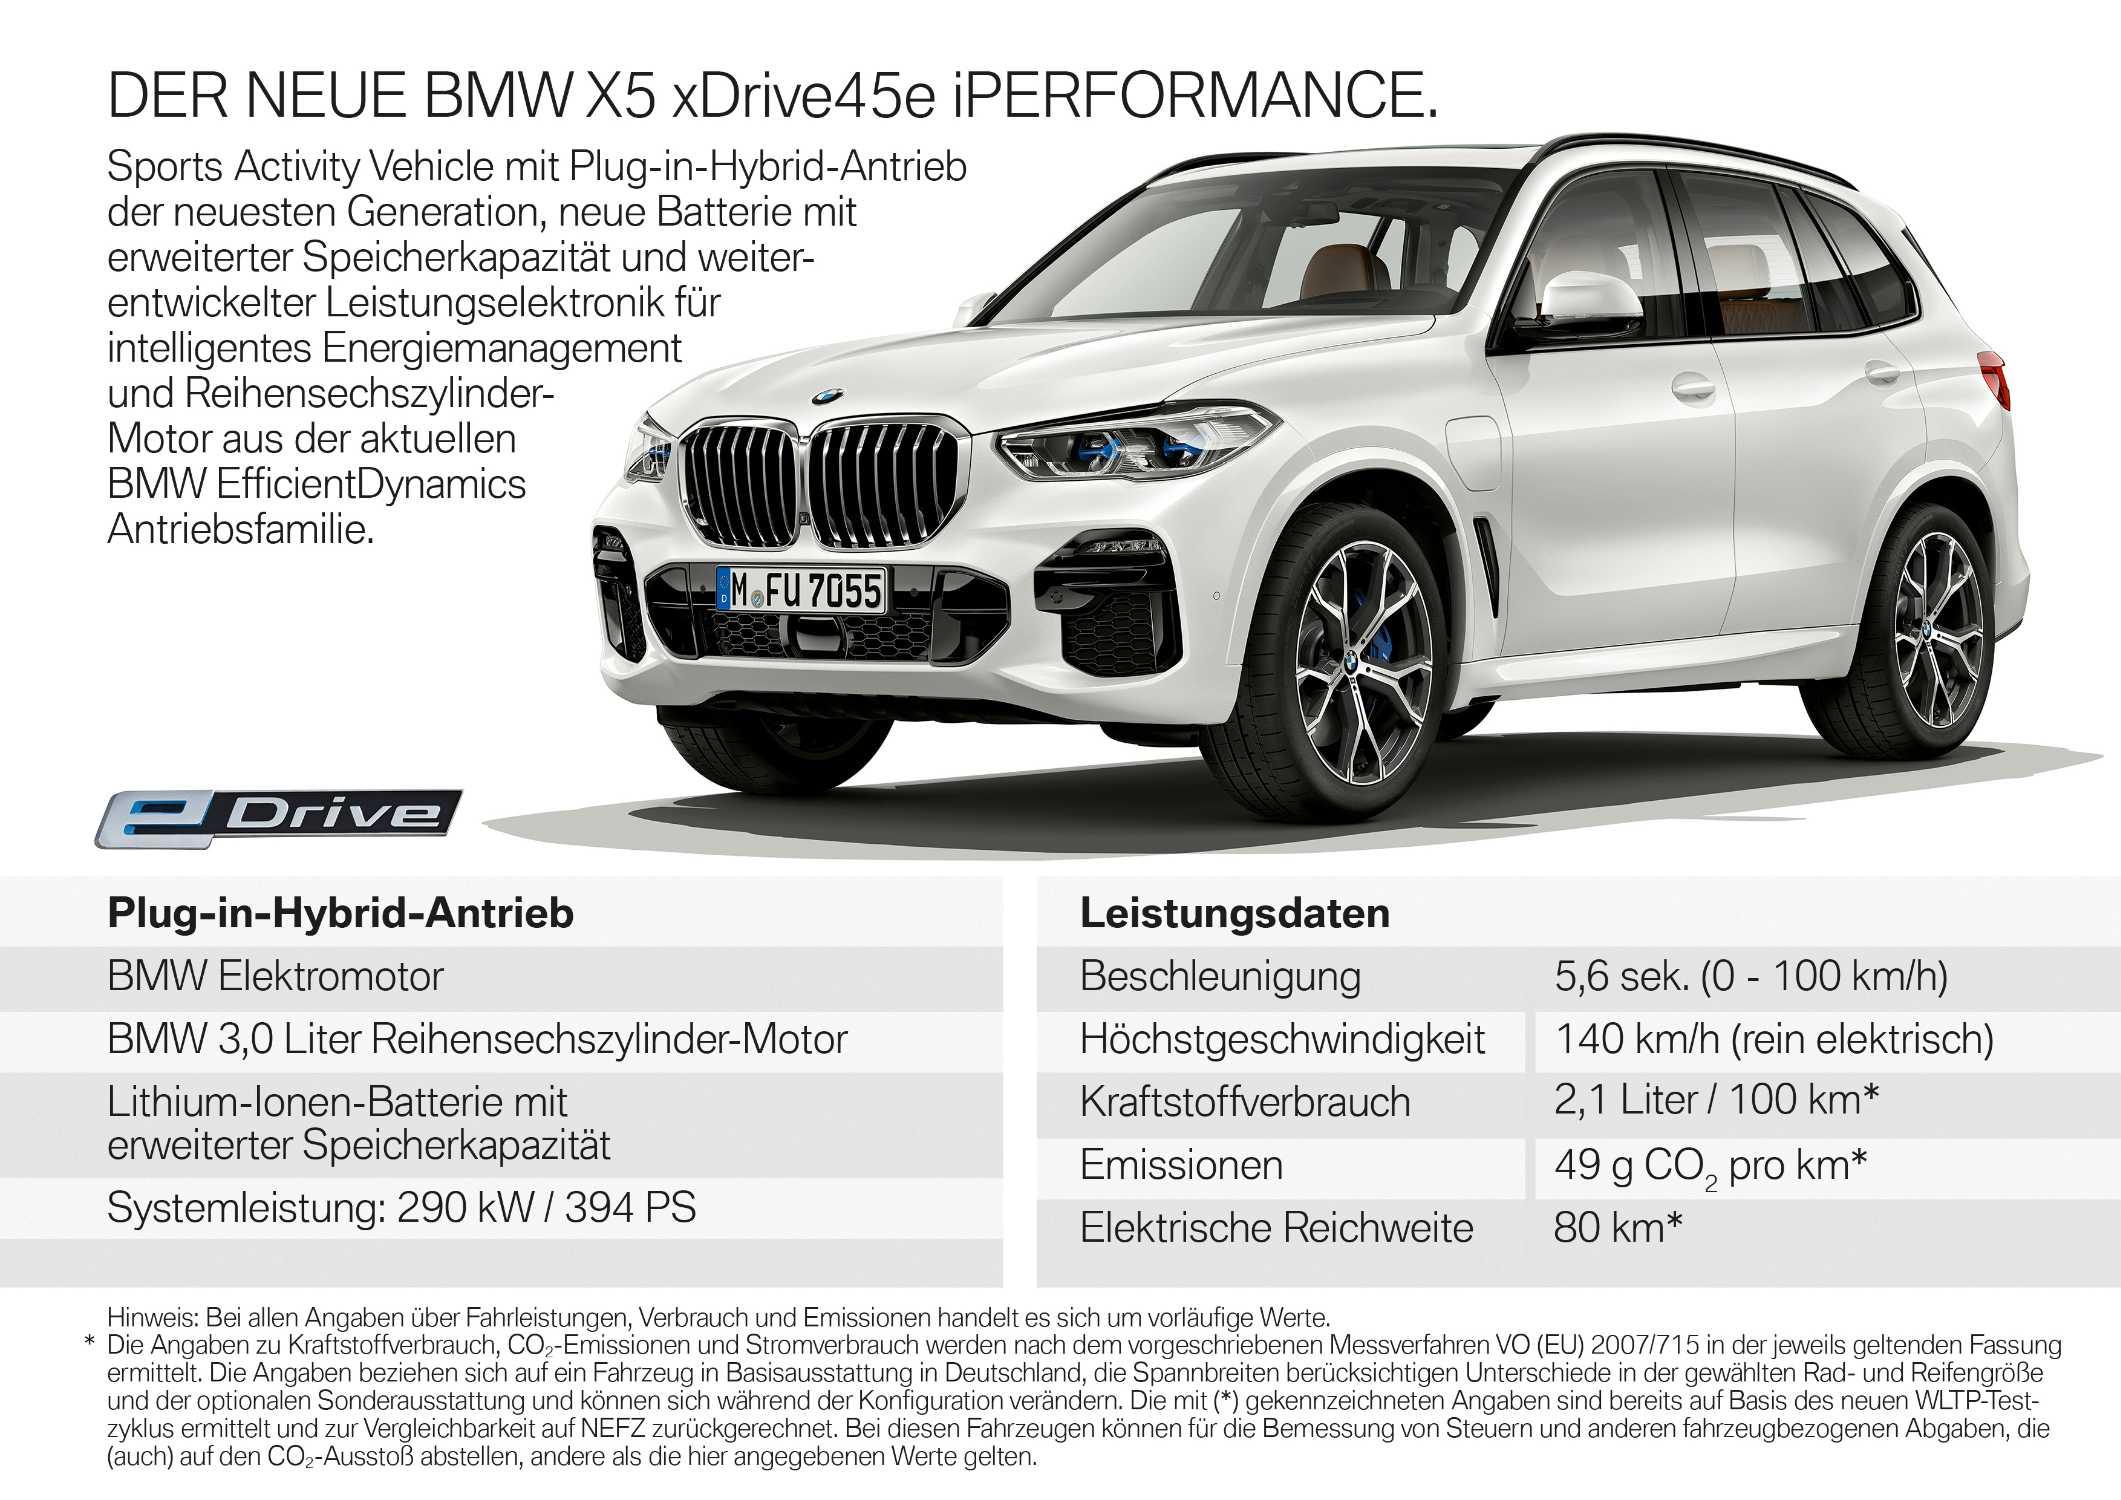 Der neue BMW X5 xDrive45e iPerformance - Produkthighlights (09/2018).